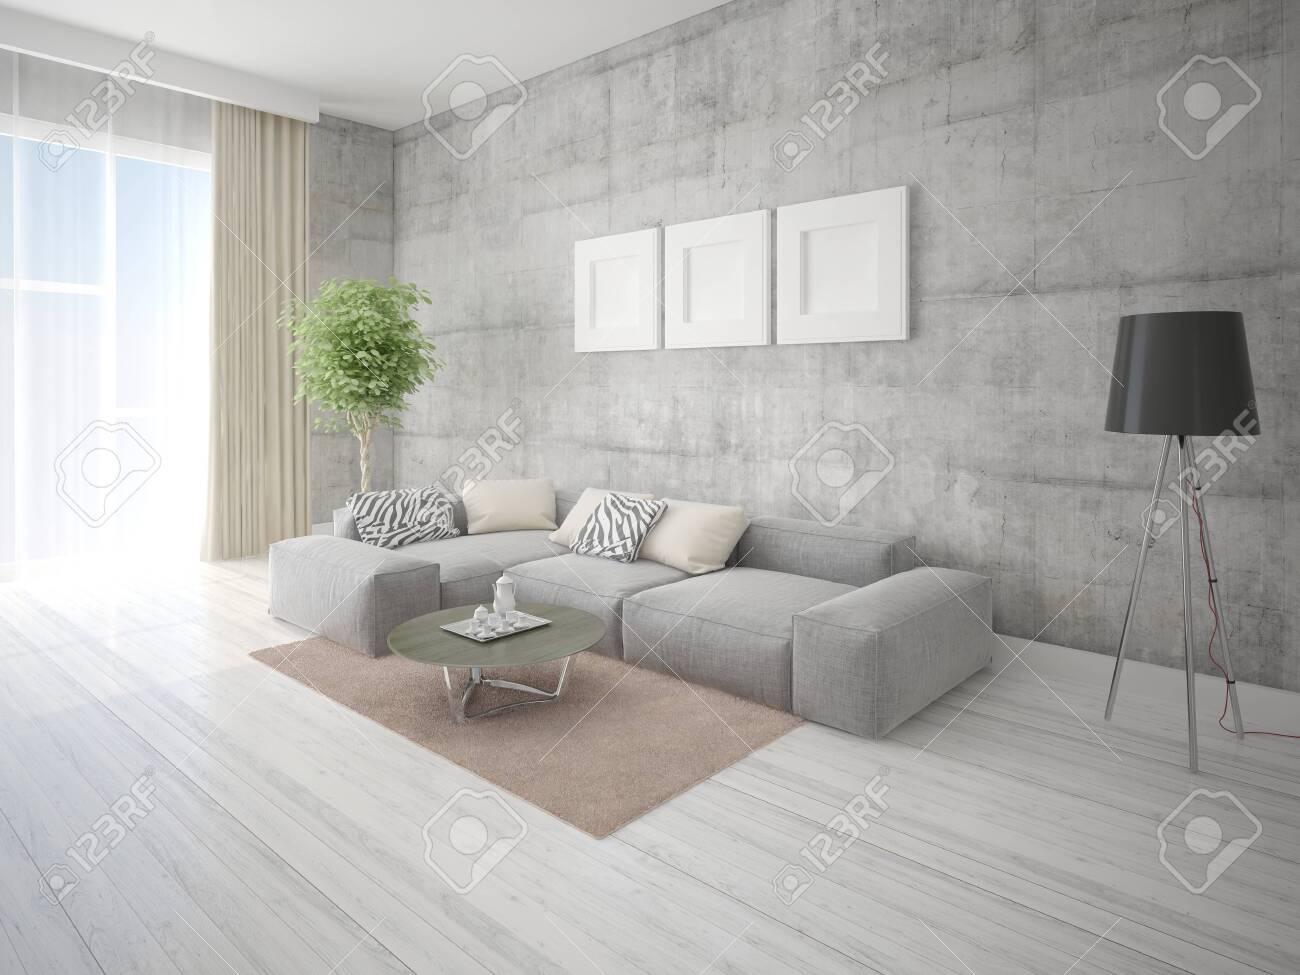 Mock up fashionable living room with large corner sofa and stylish..